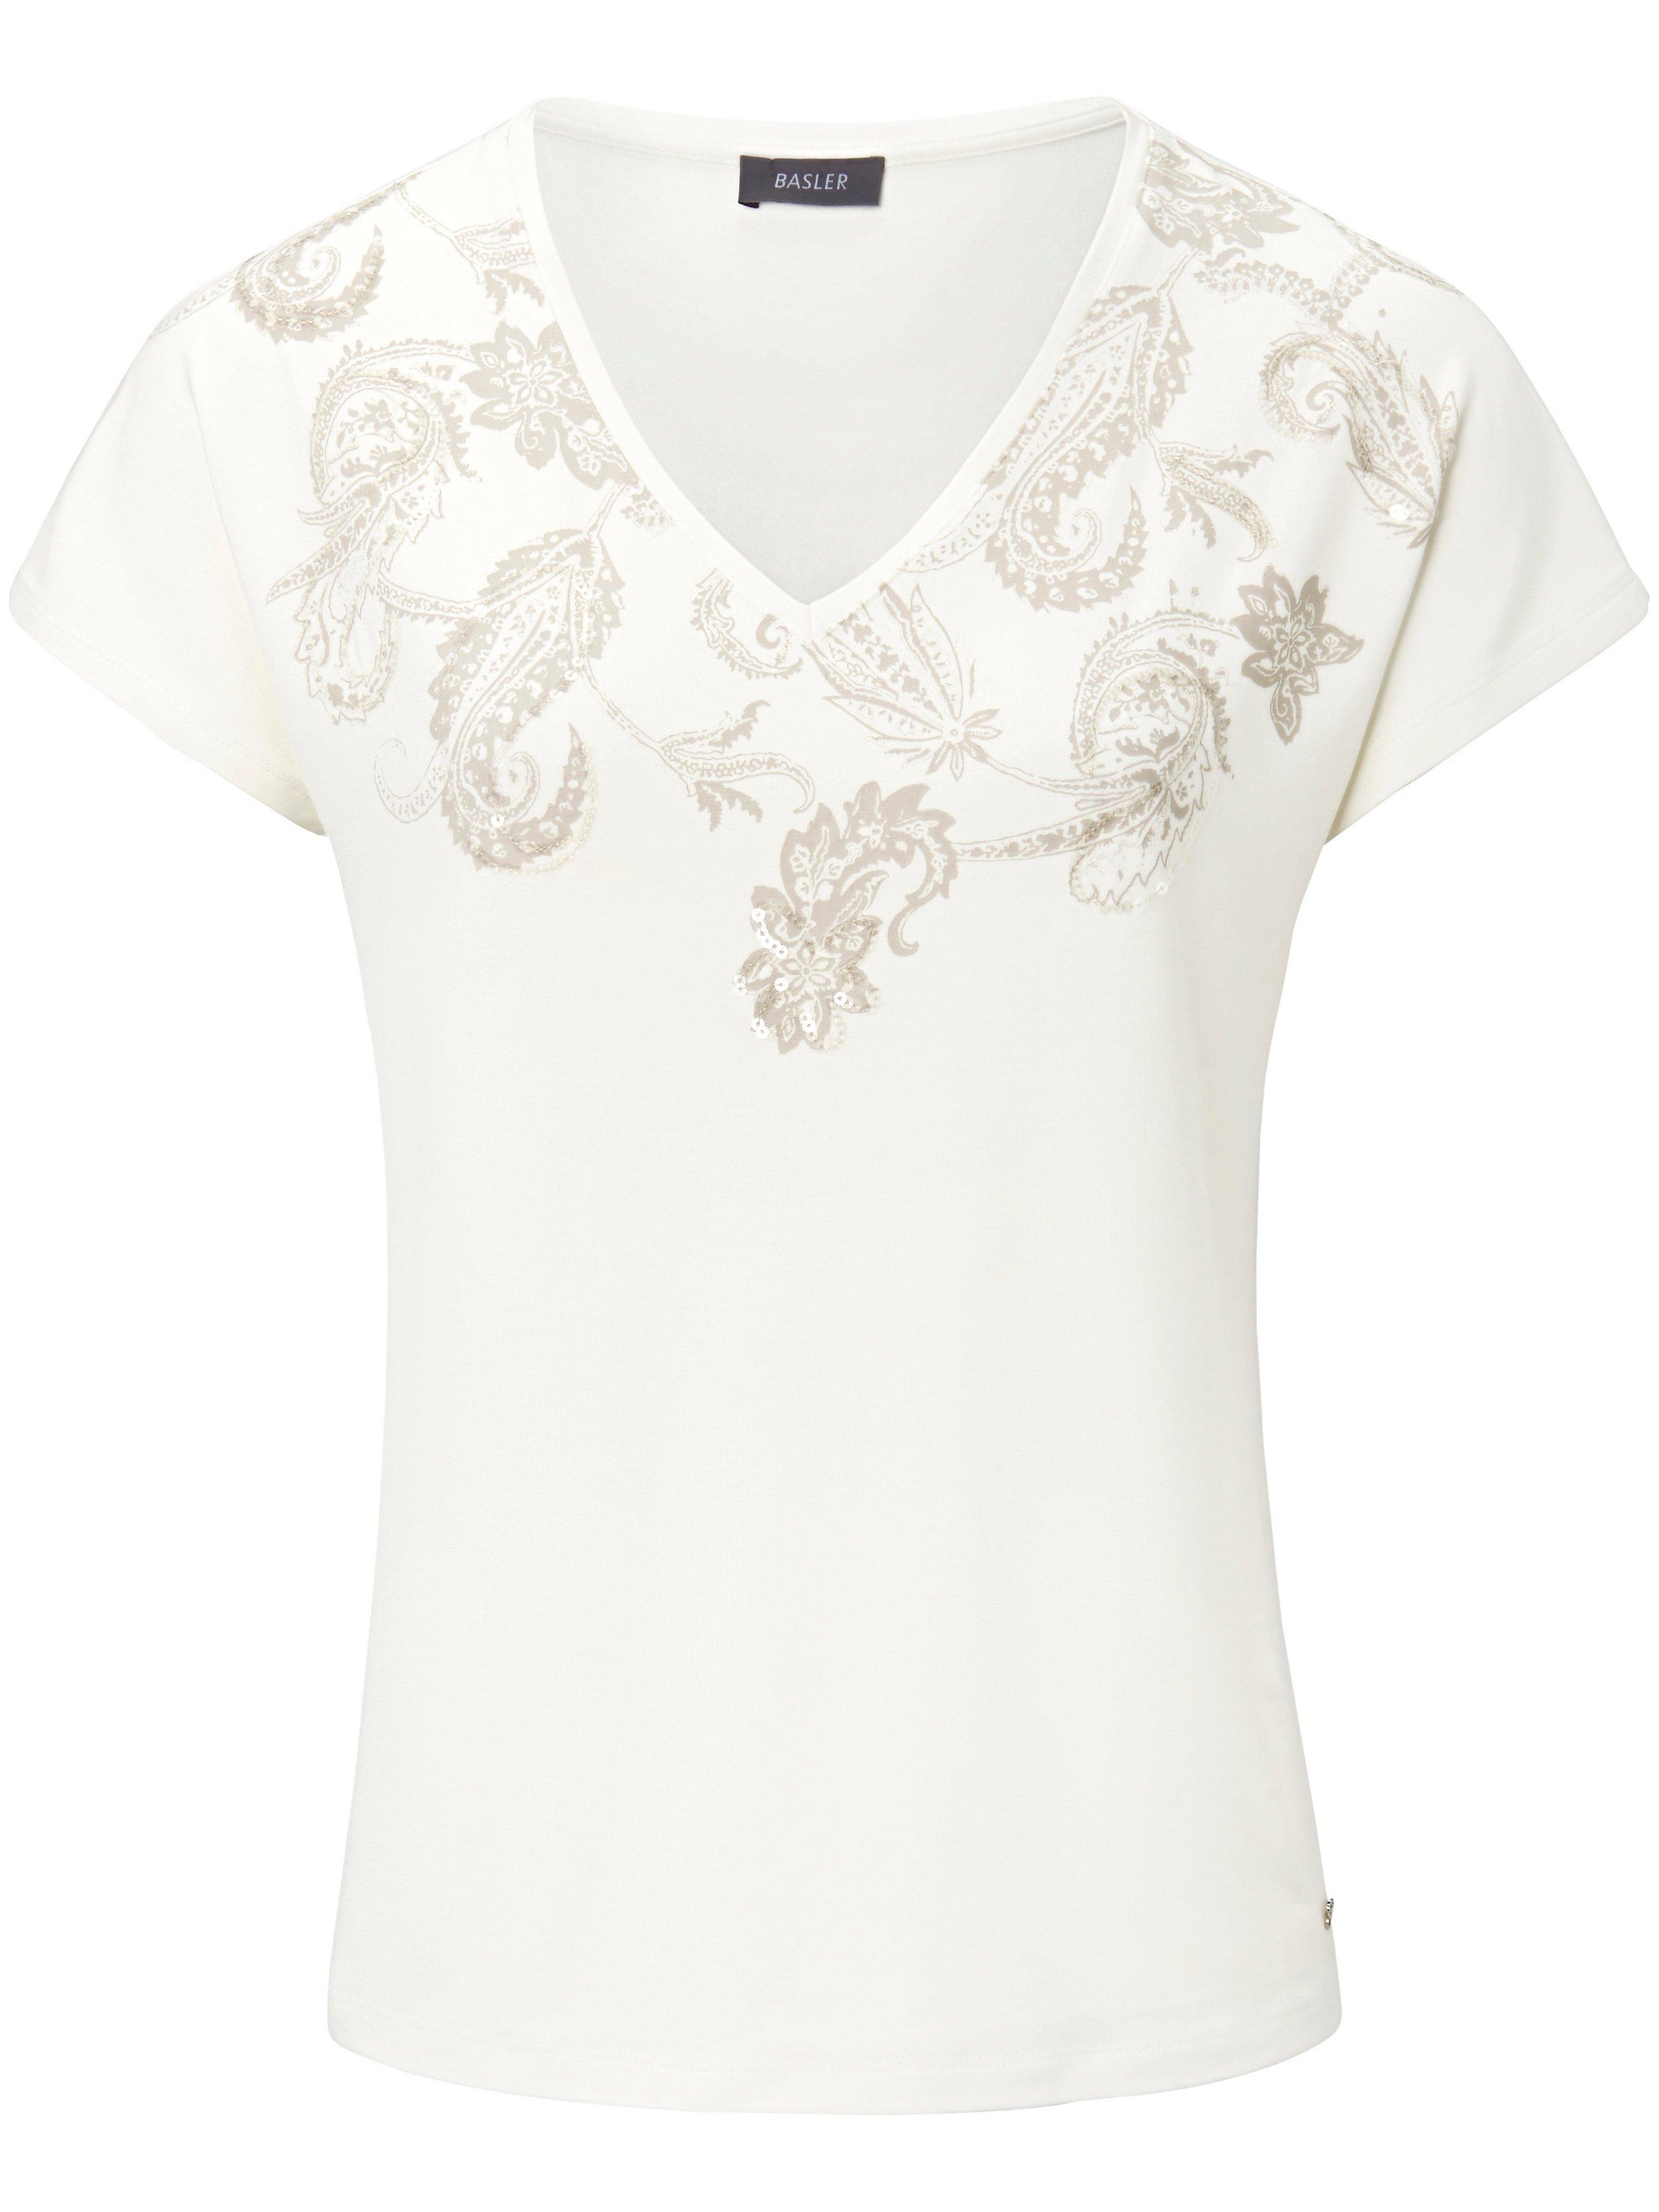 V-Shirt 1/2-Kimono-Arm Basler weiss | Bekleidung > Shirts > V-Shirts | Basler